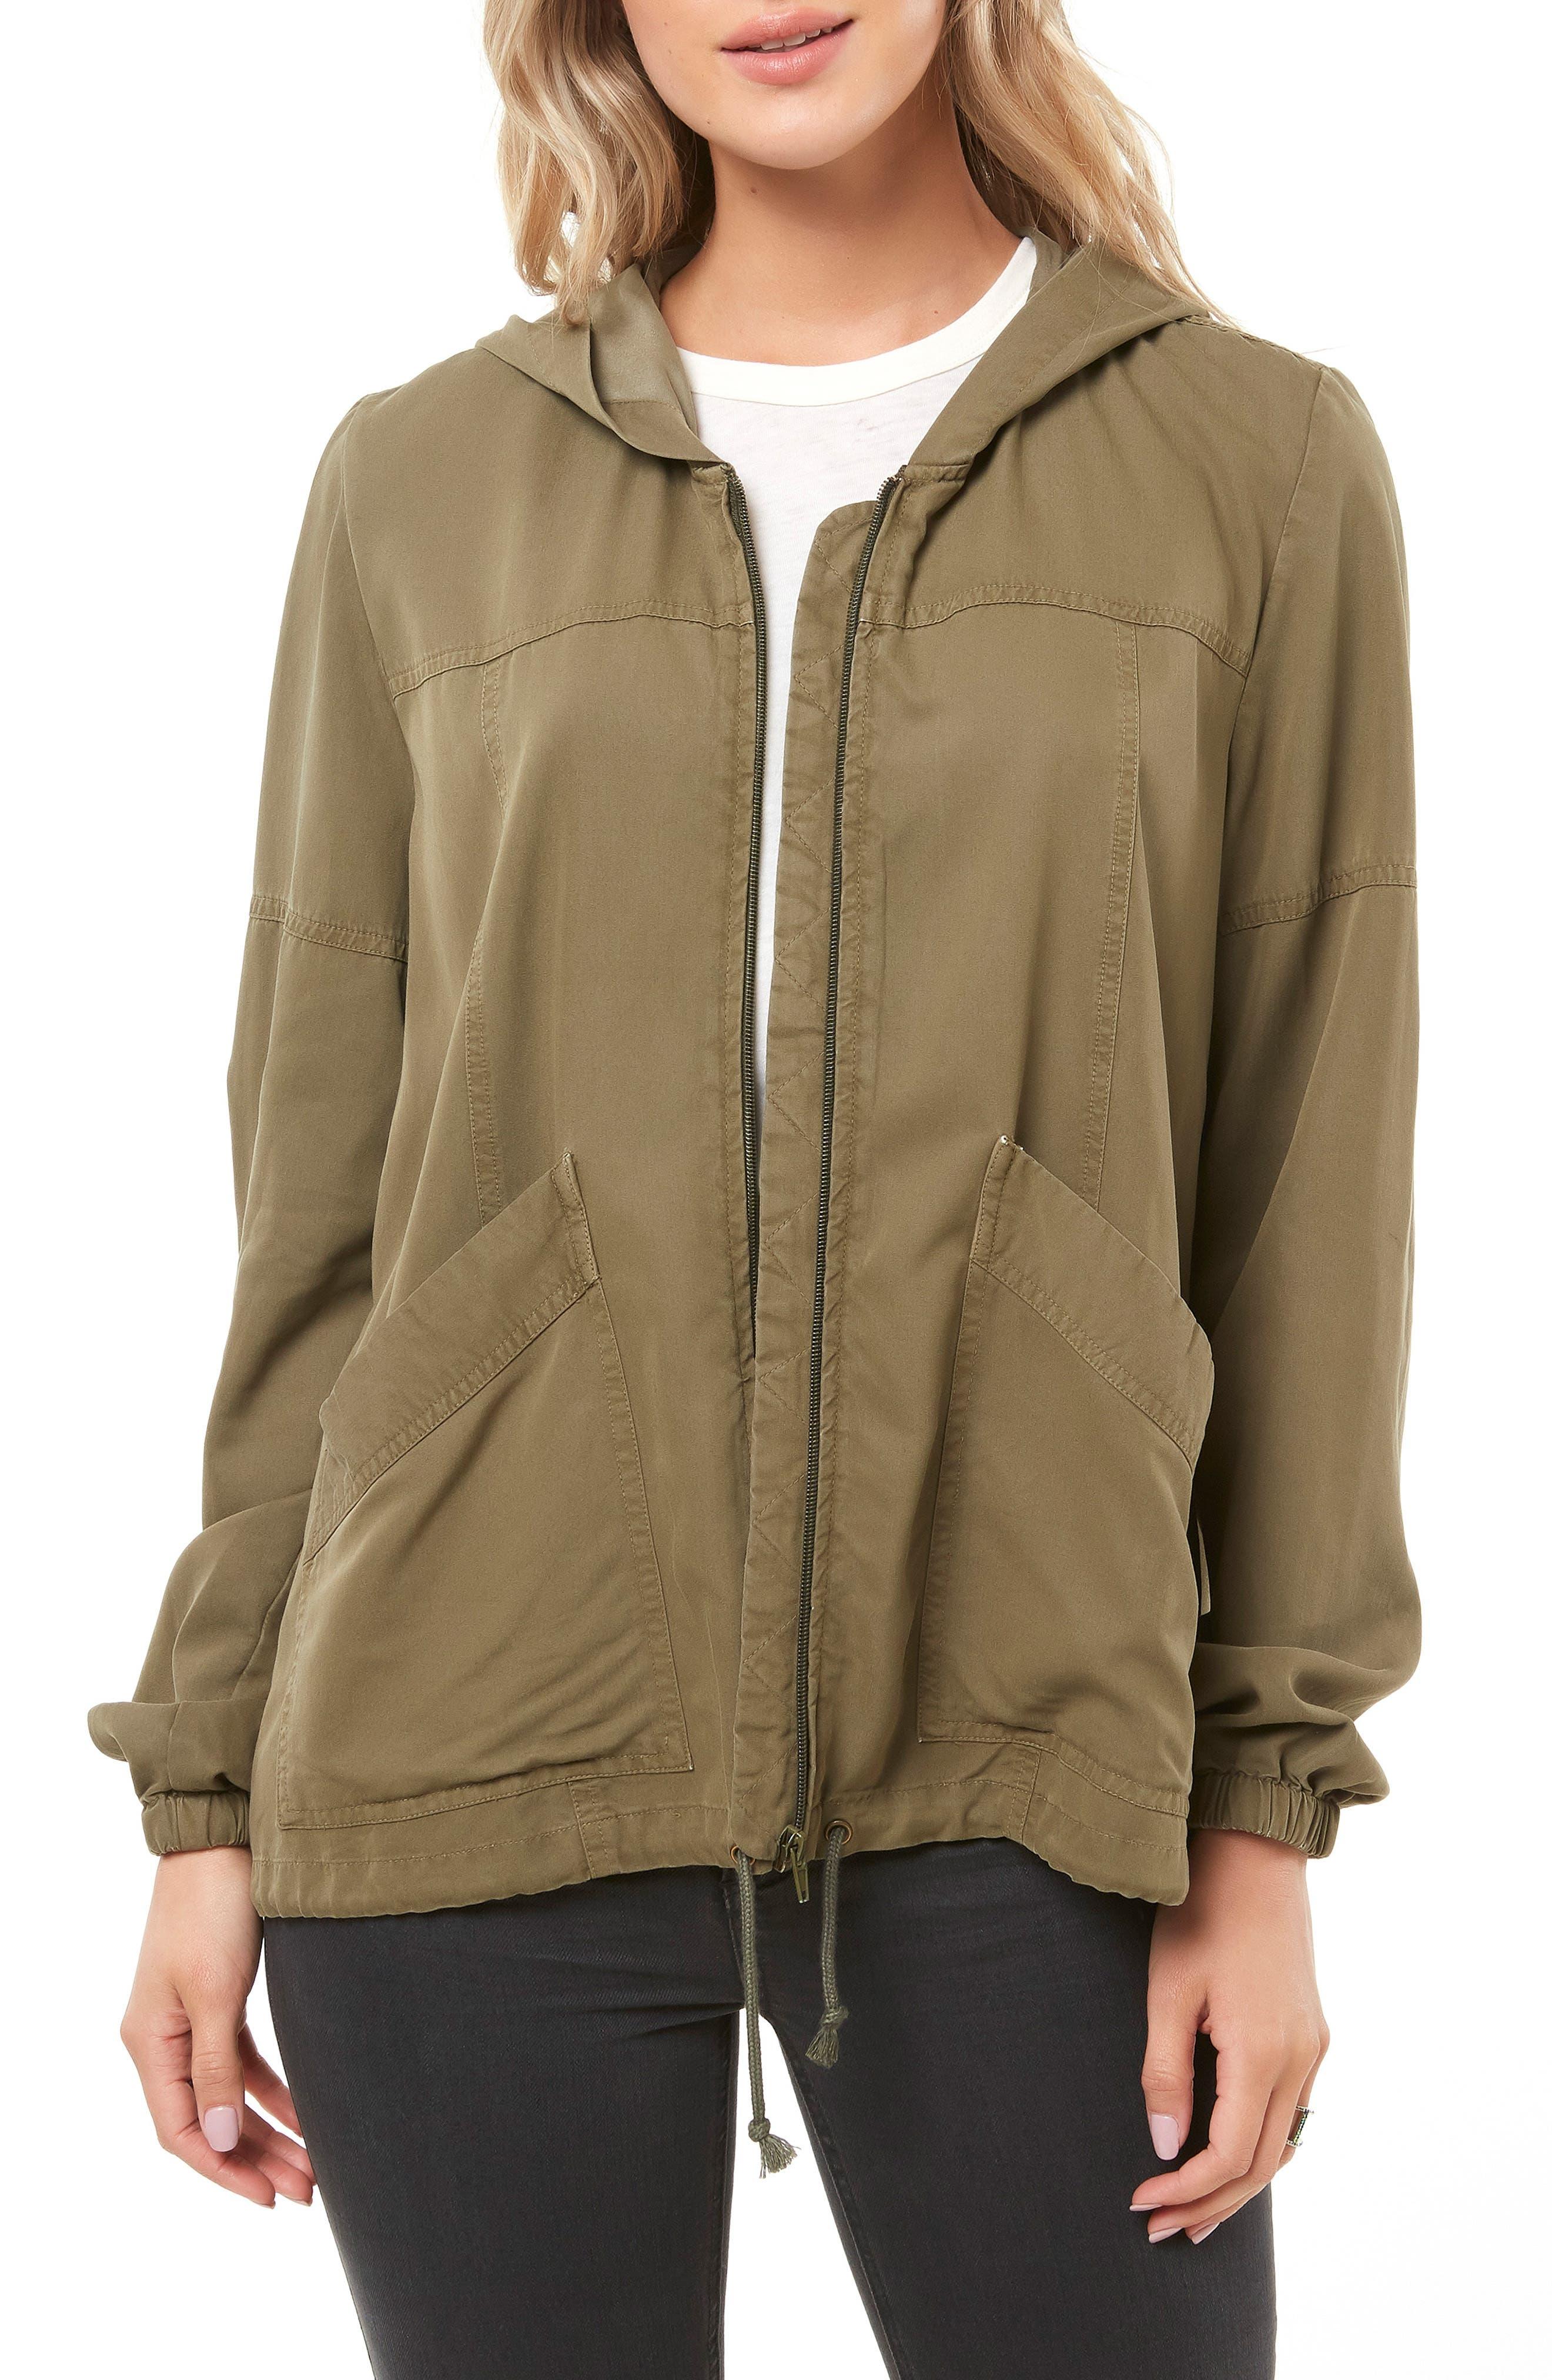 Nance Twill Jacket,                         Main,                         color, 300